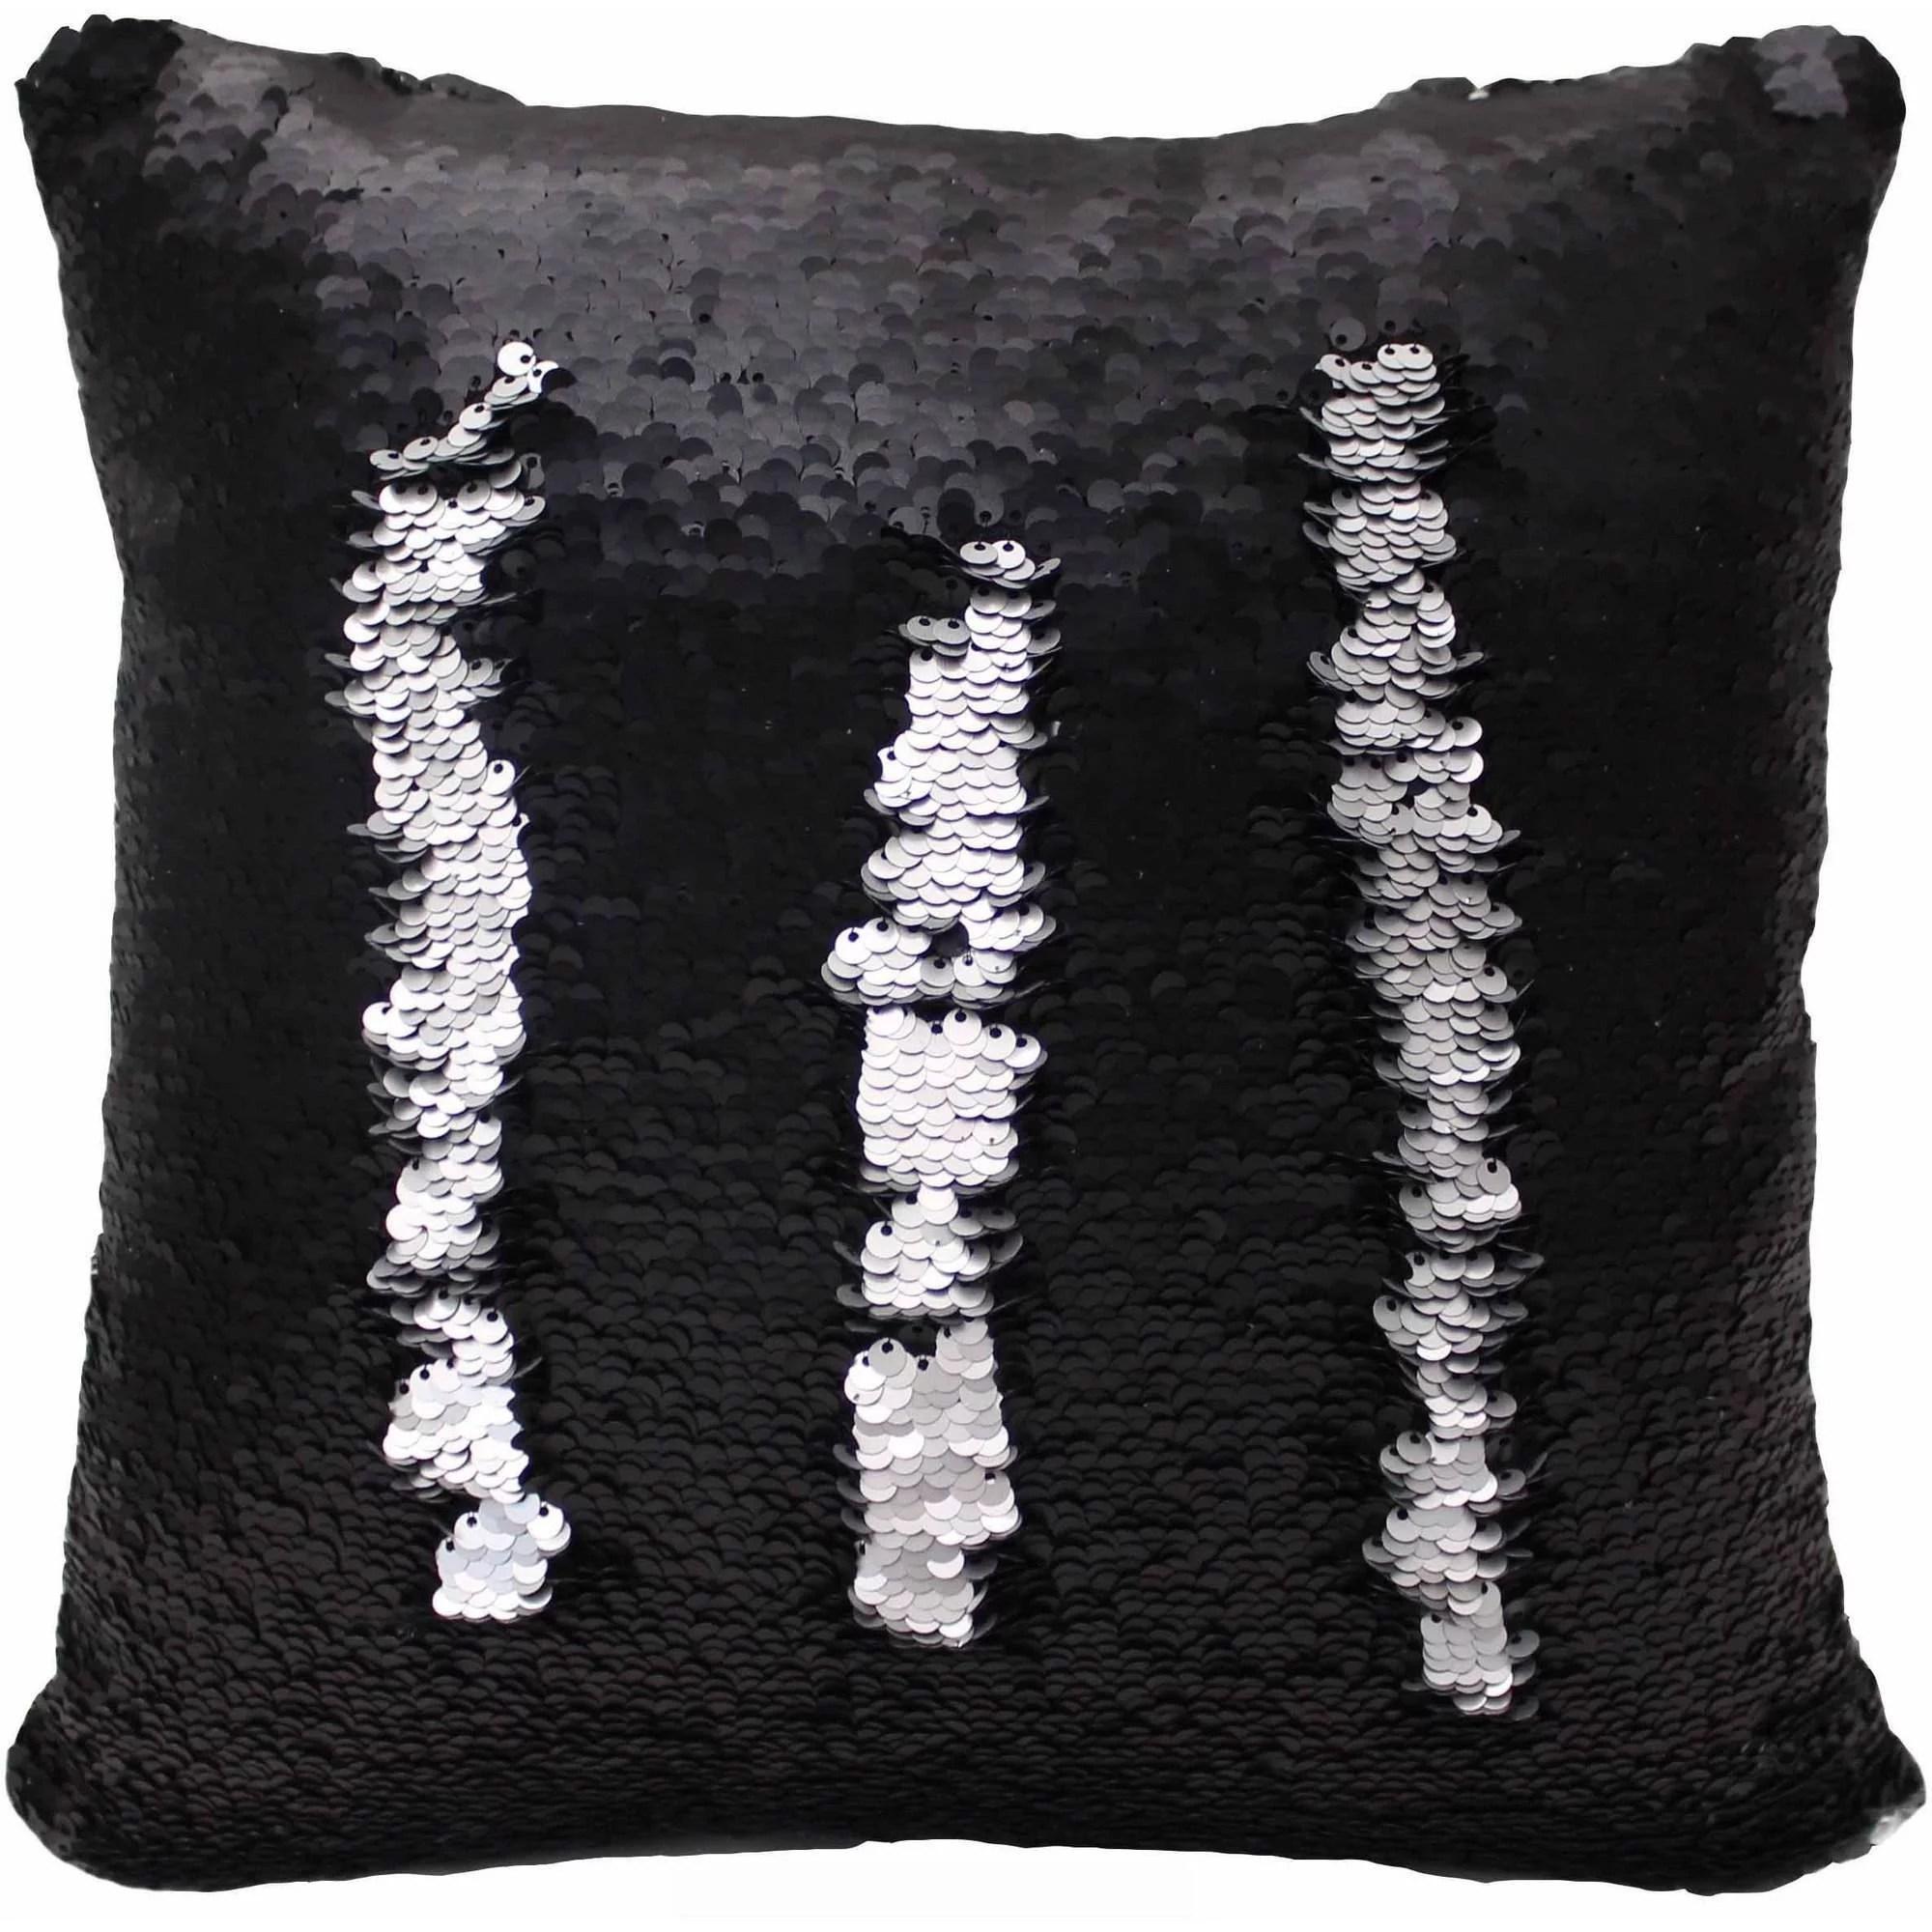 posh home sequined mermaid decorative pillow walmart com